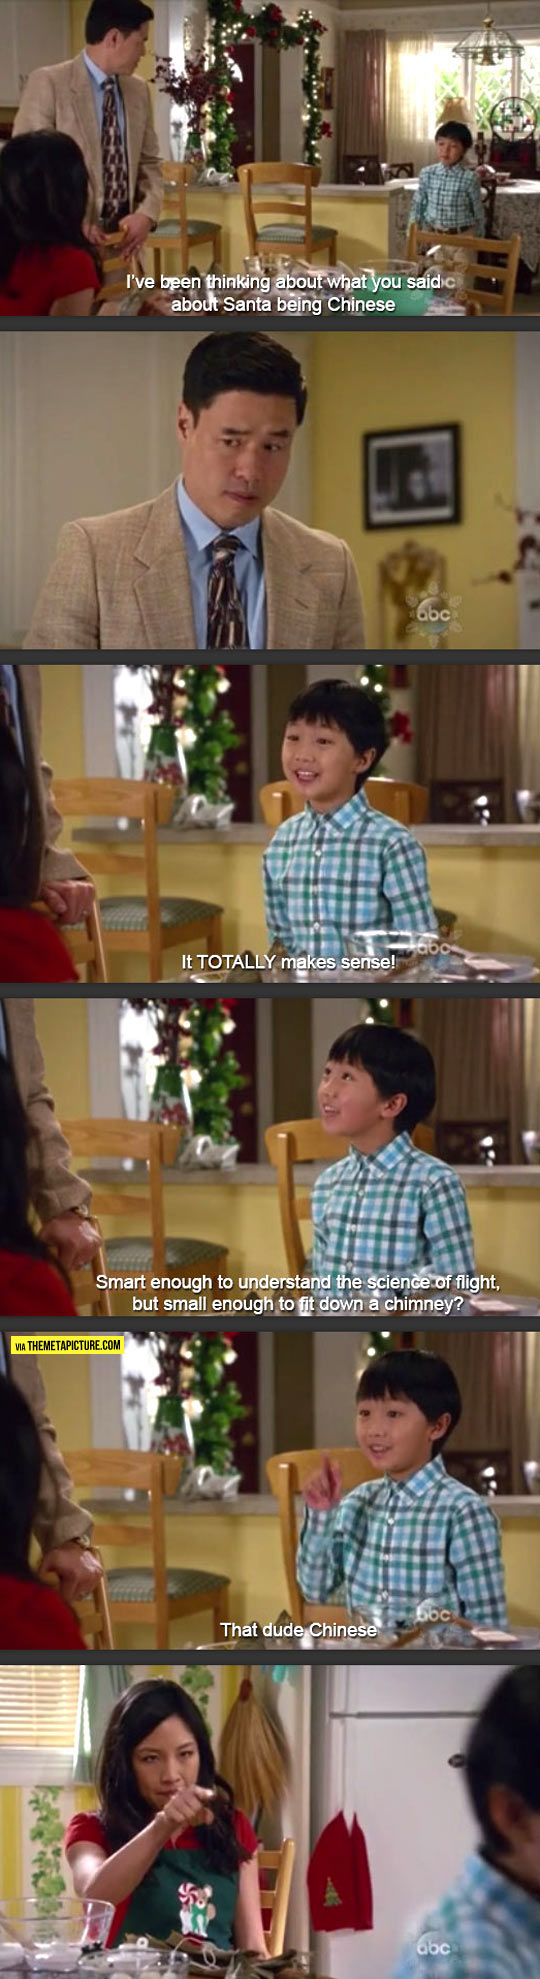 funny-Santa-China-TV-show-scene